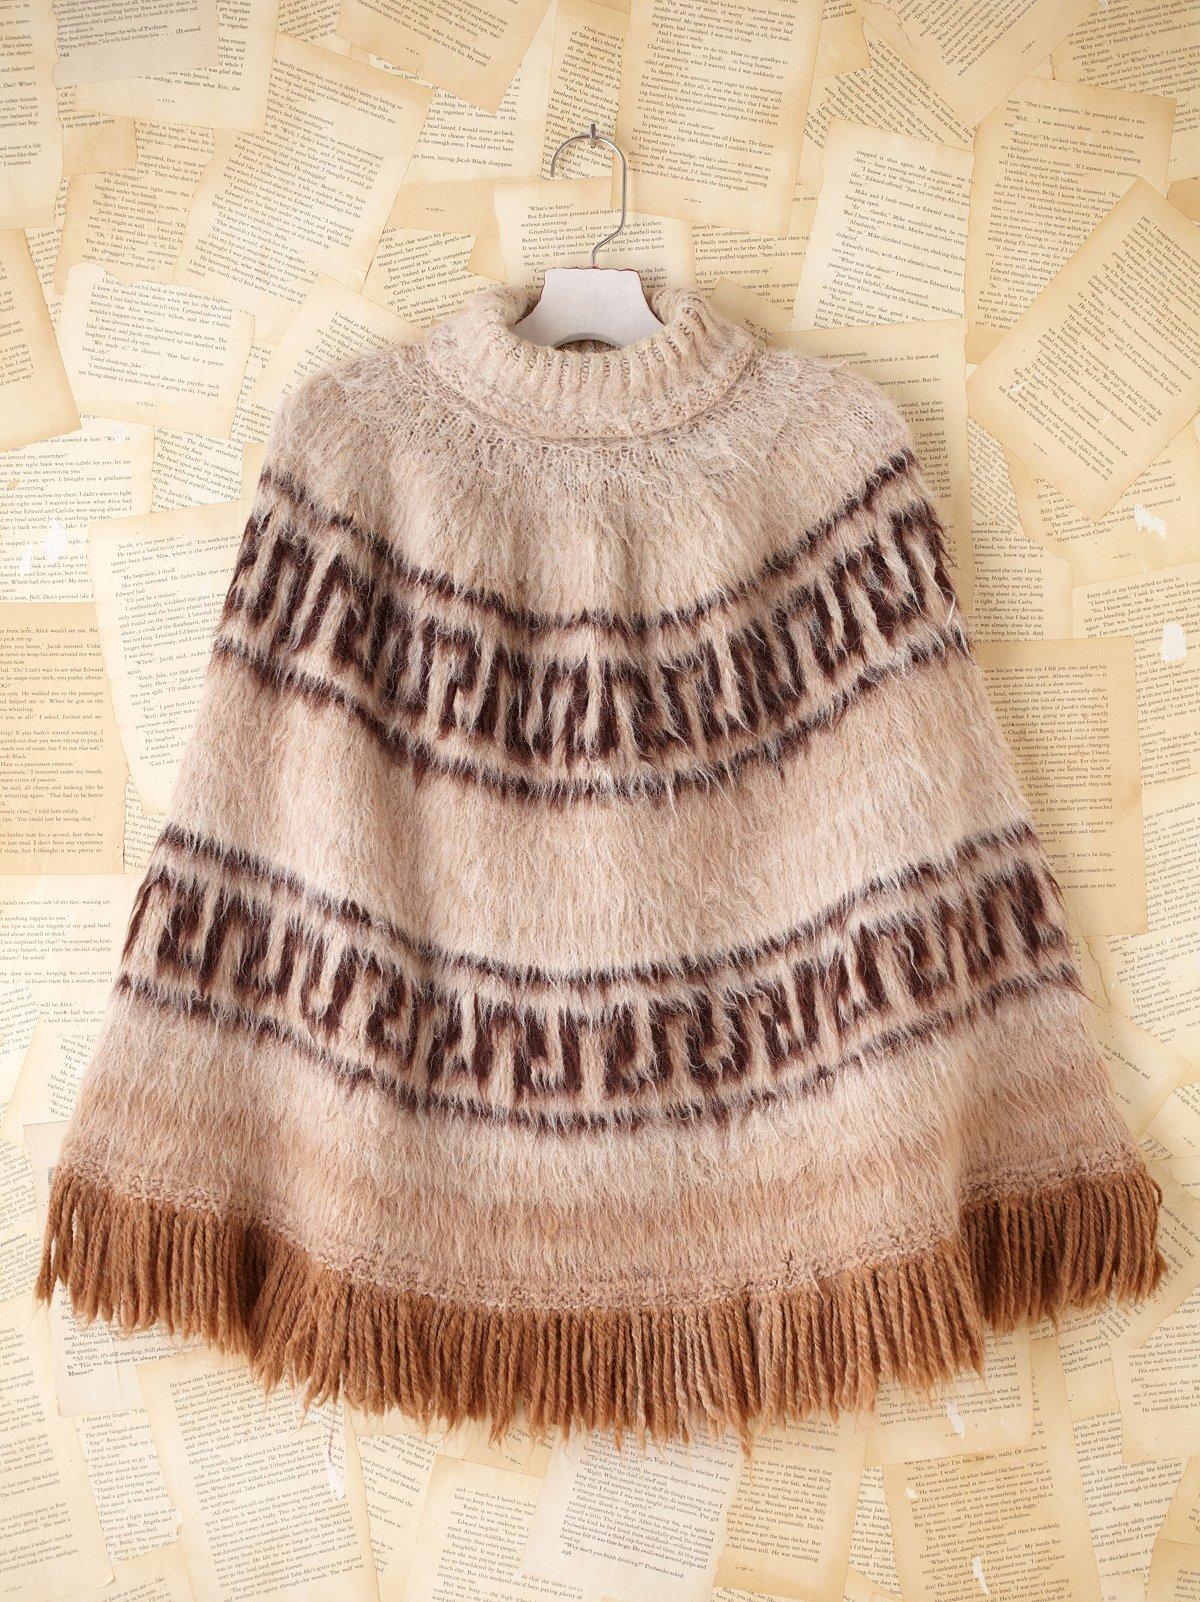 Vintage Bolivian Poncho